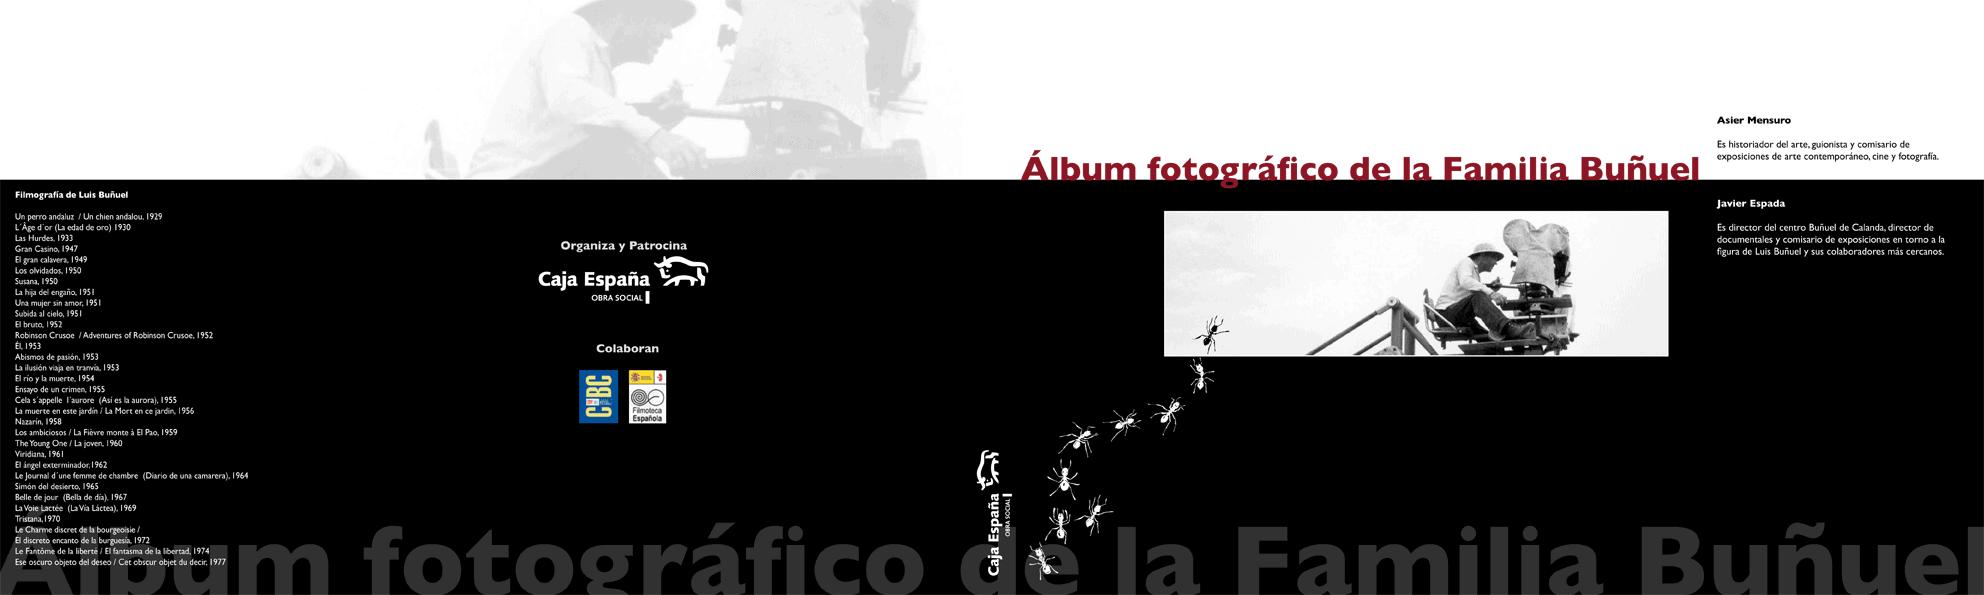 catalogo_Album fotografico familia Buñuel01